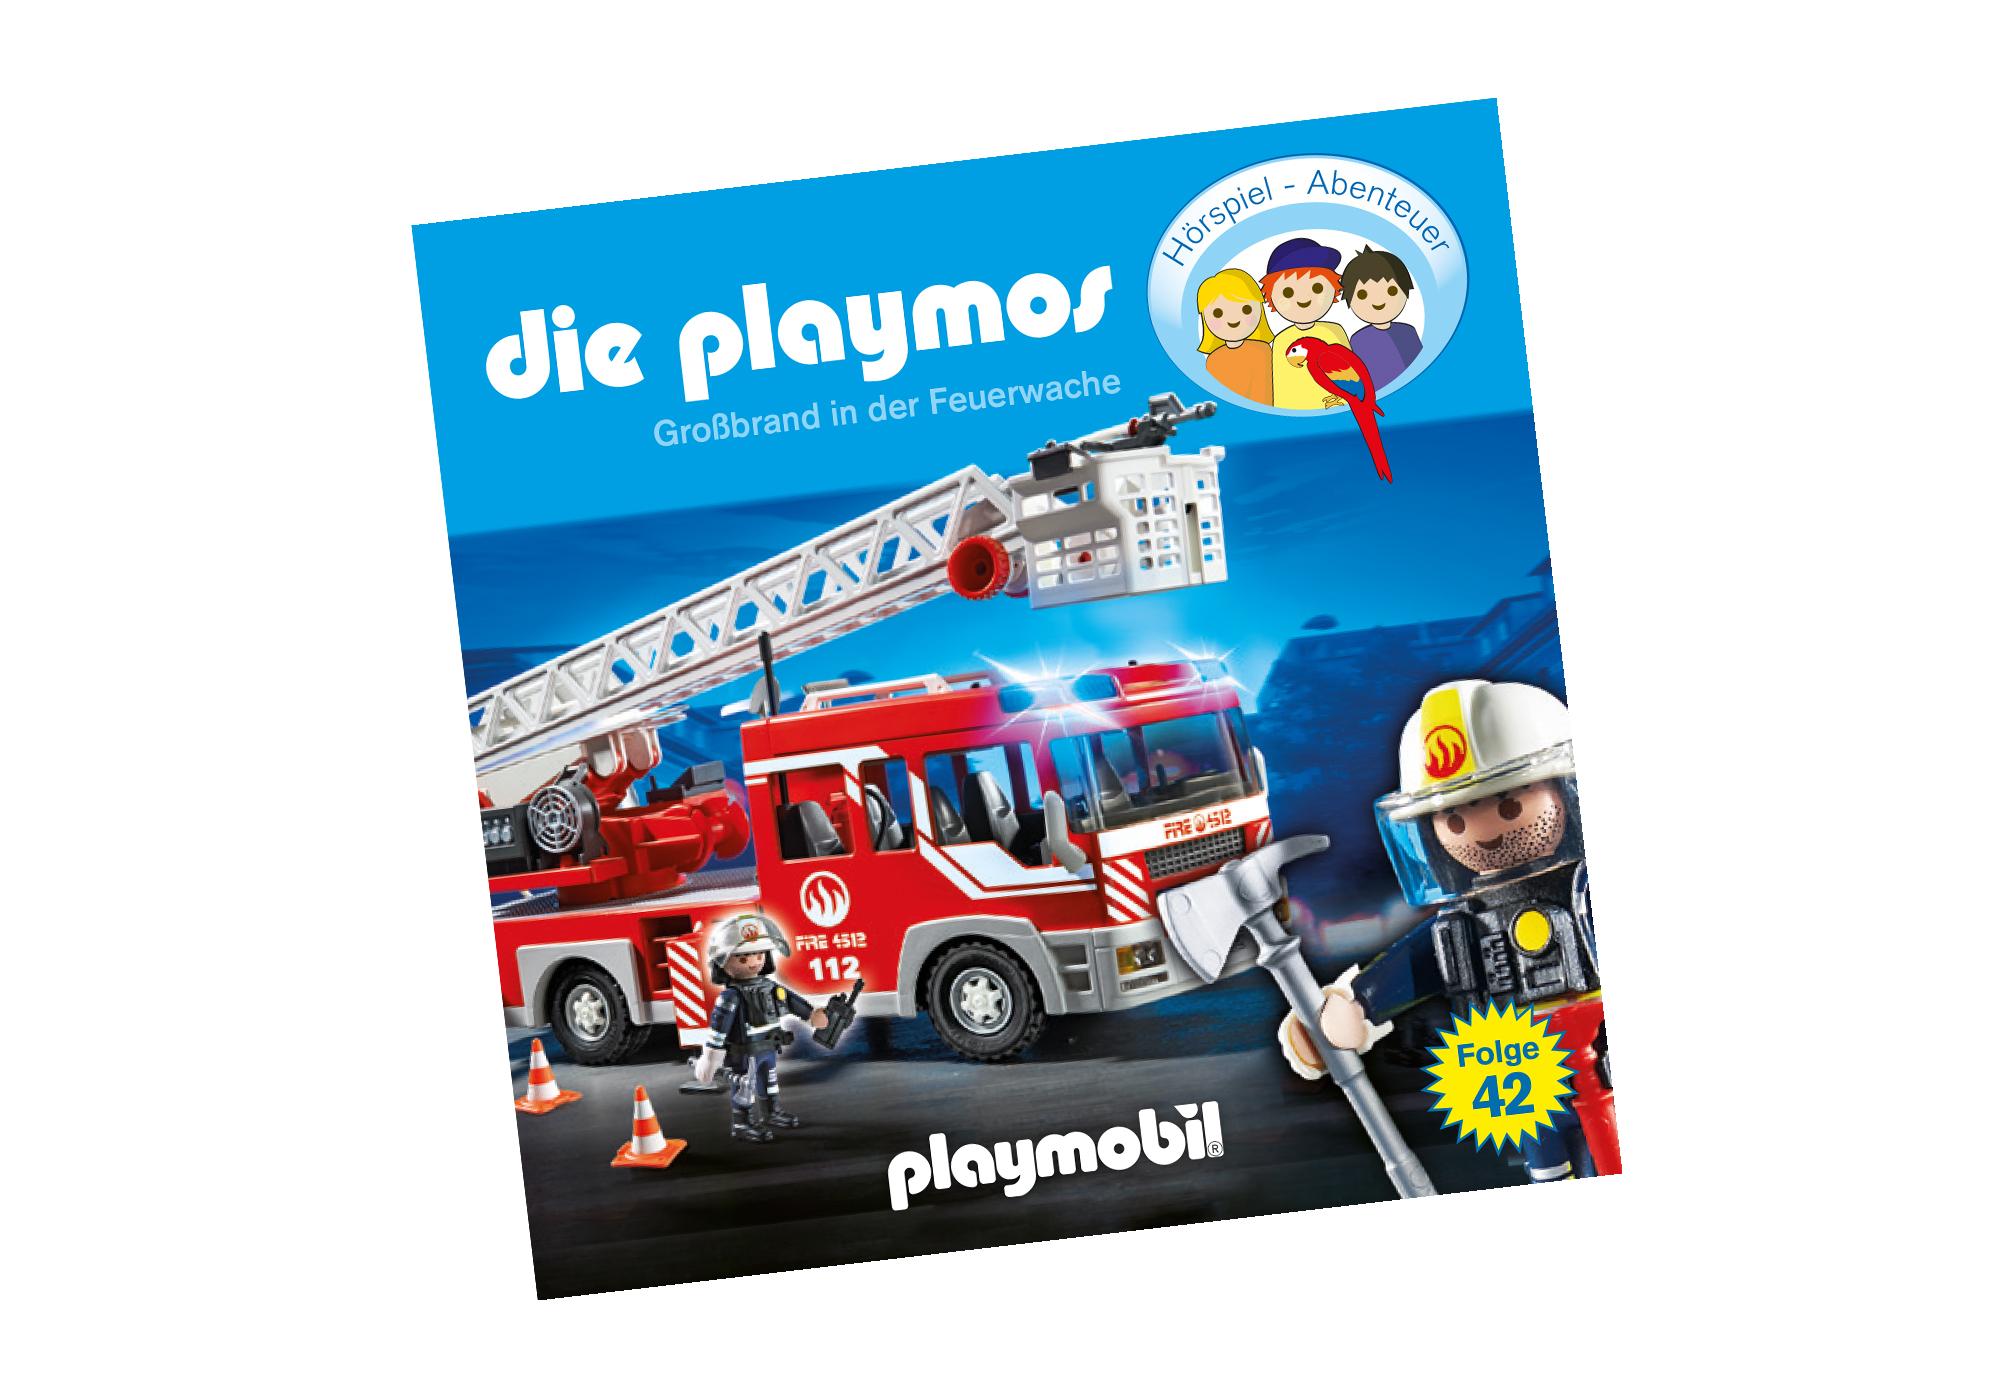 http://media.playmobil.com/i/playmobil/80455_product_detail